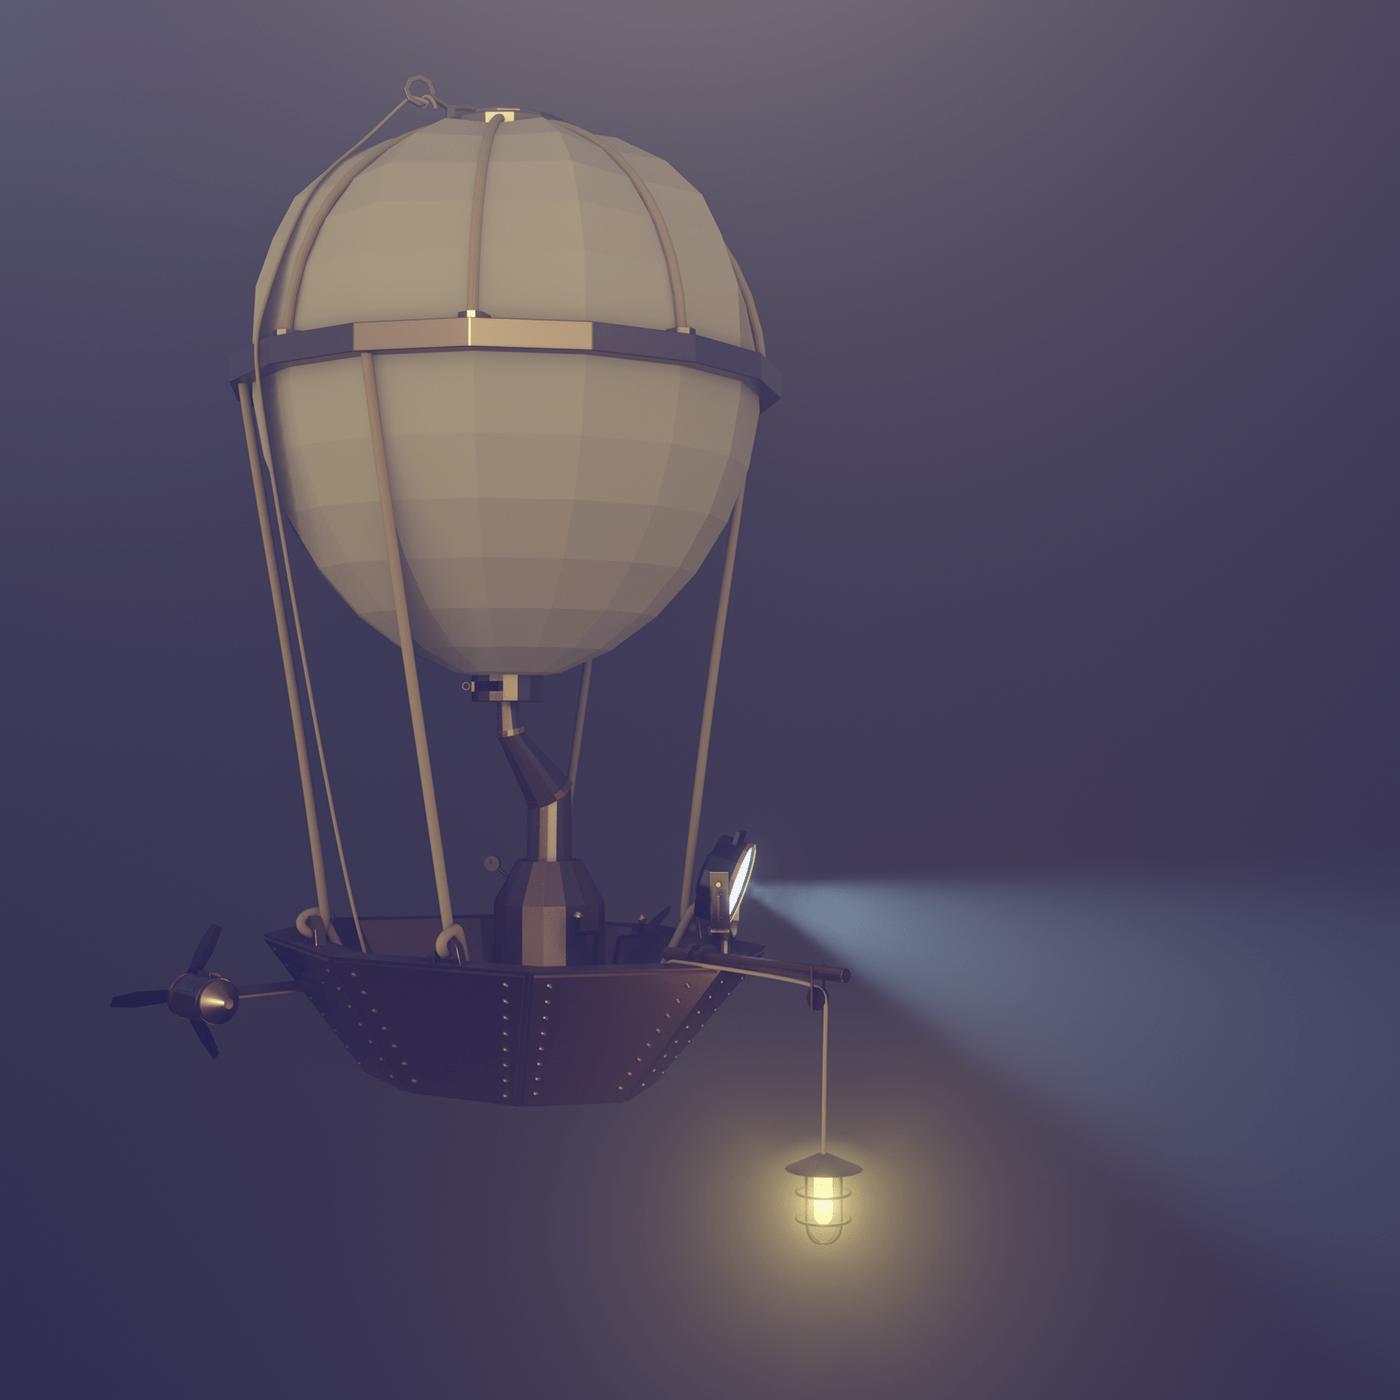 STEAMPUNK balloon Diorama 3D environment fantasy Vehicle